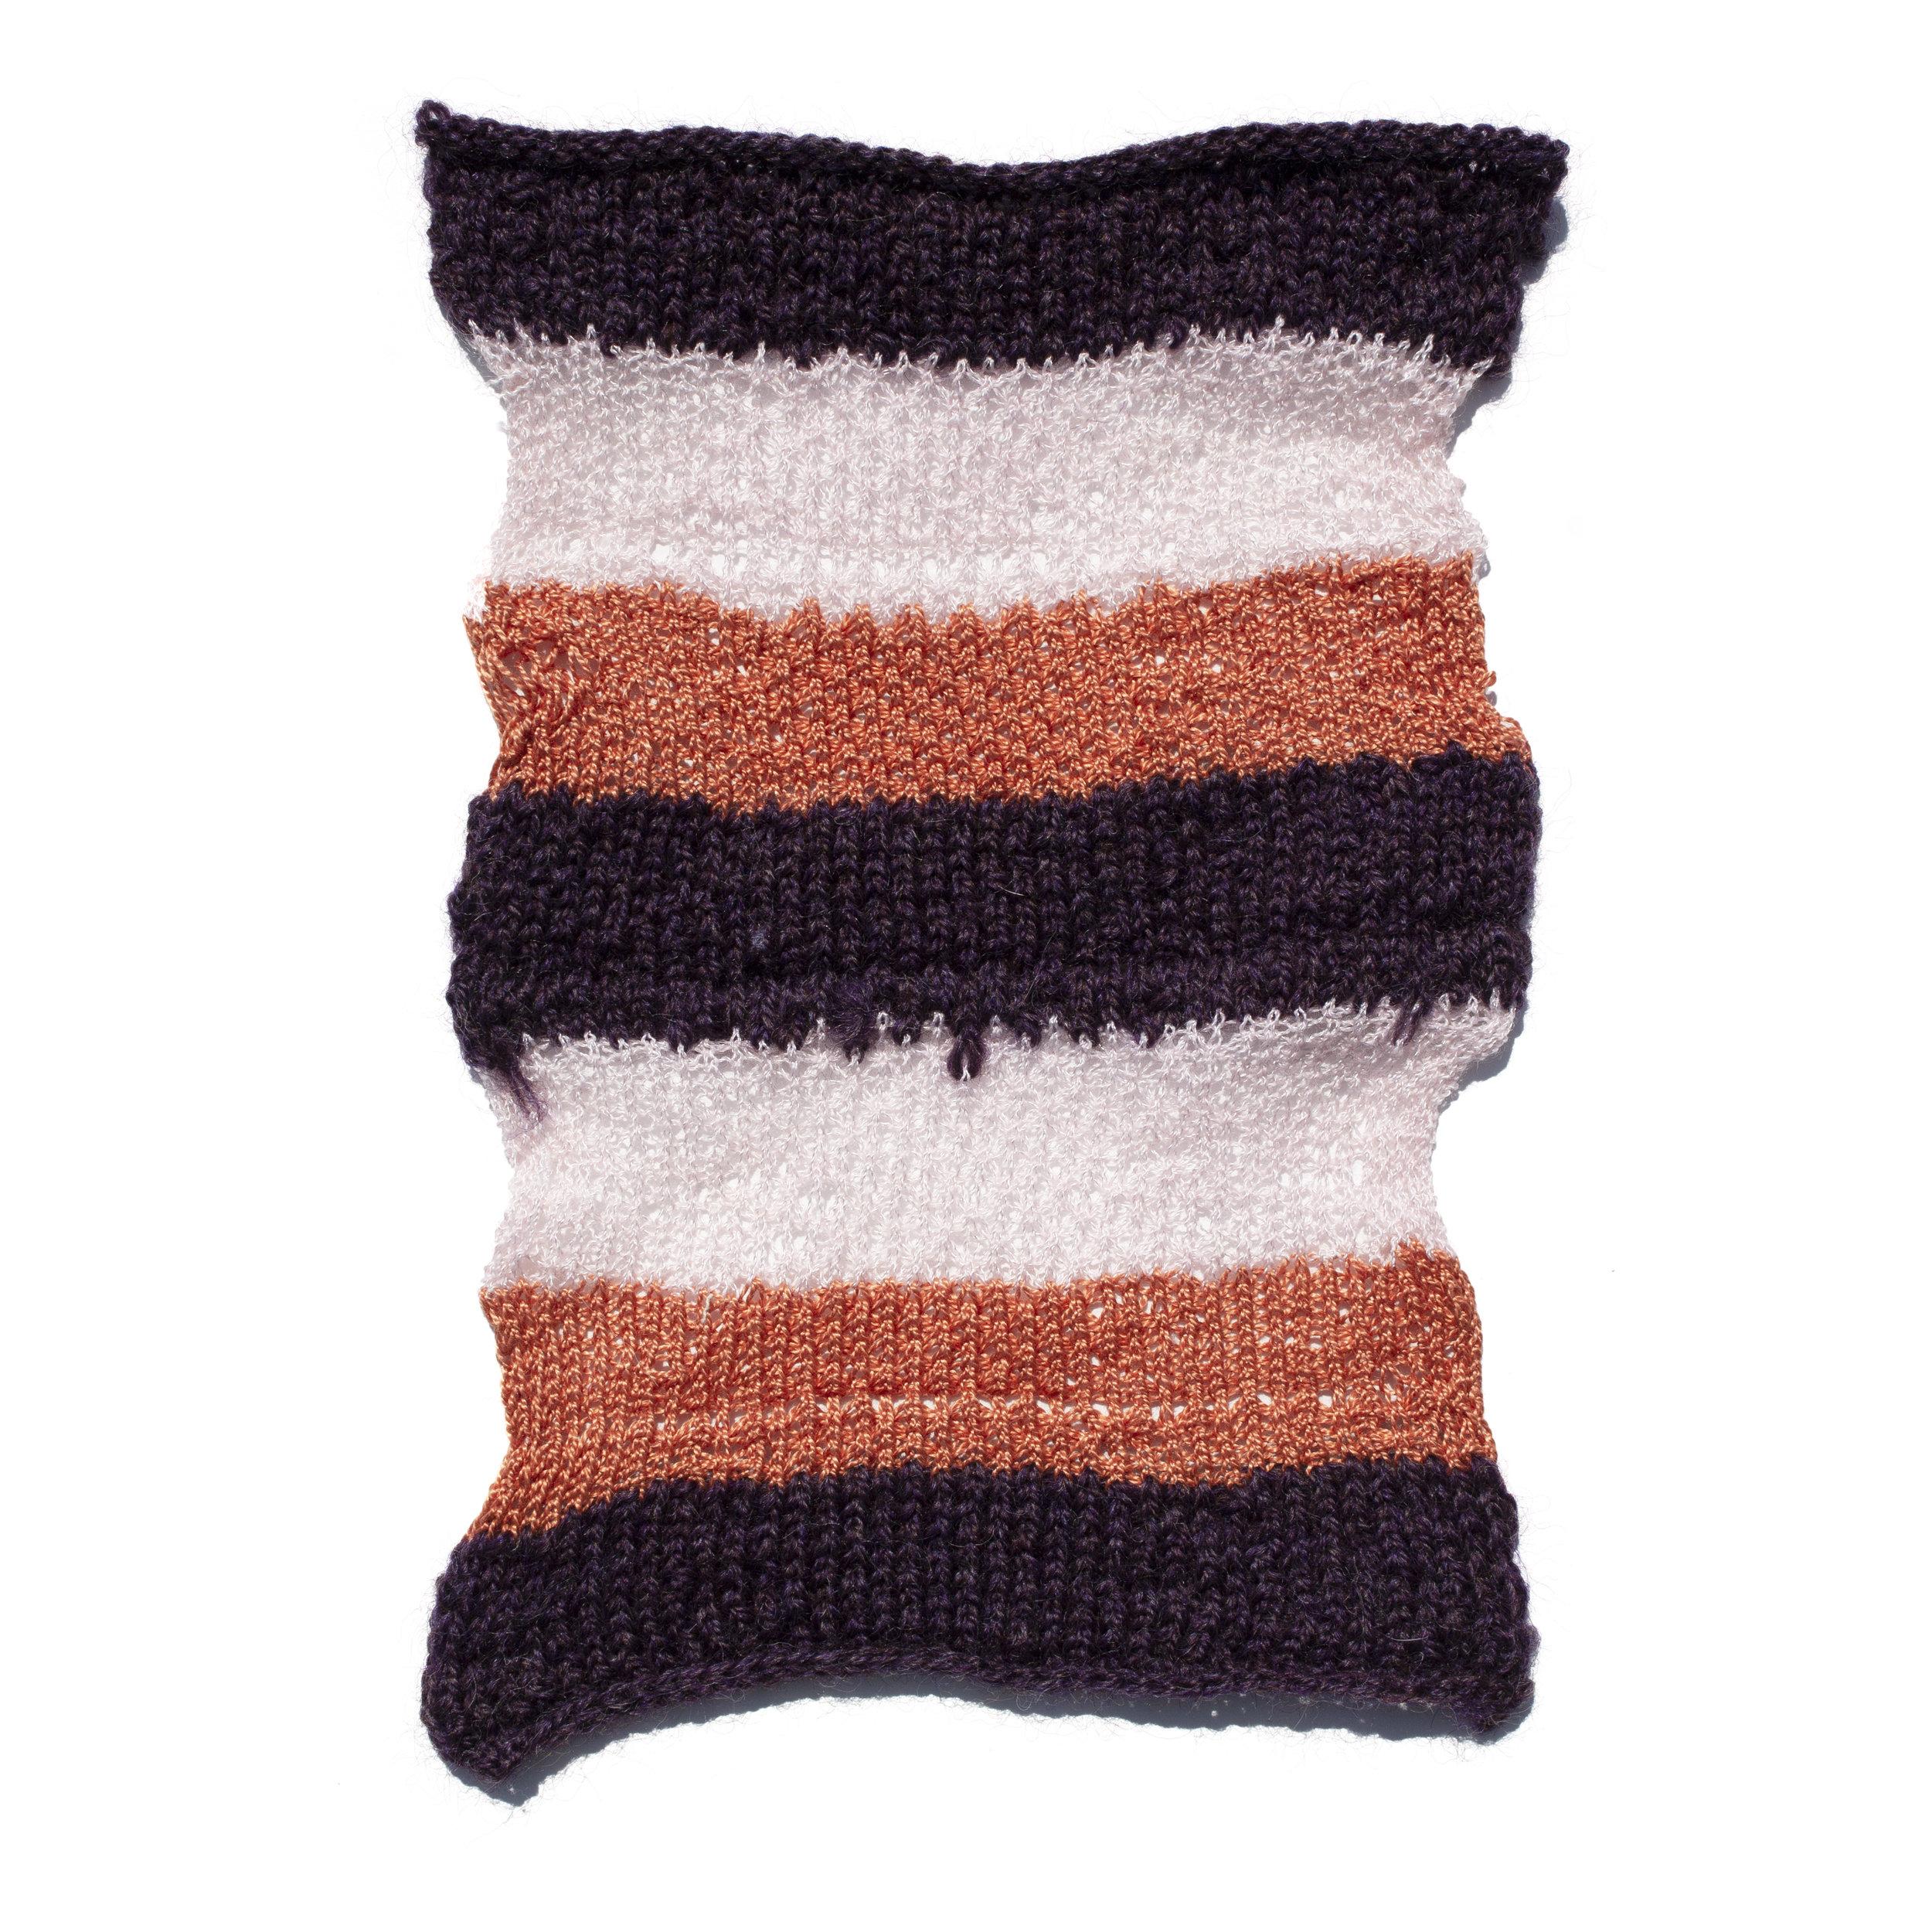 knit12 2.jpg